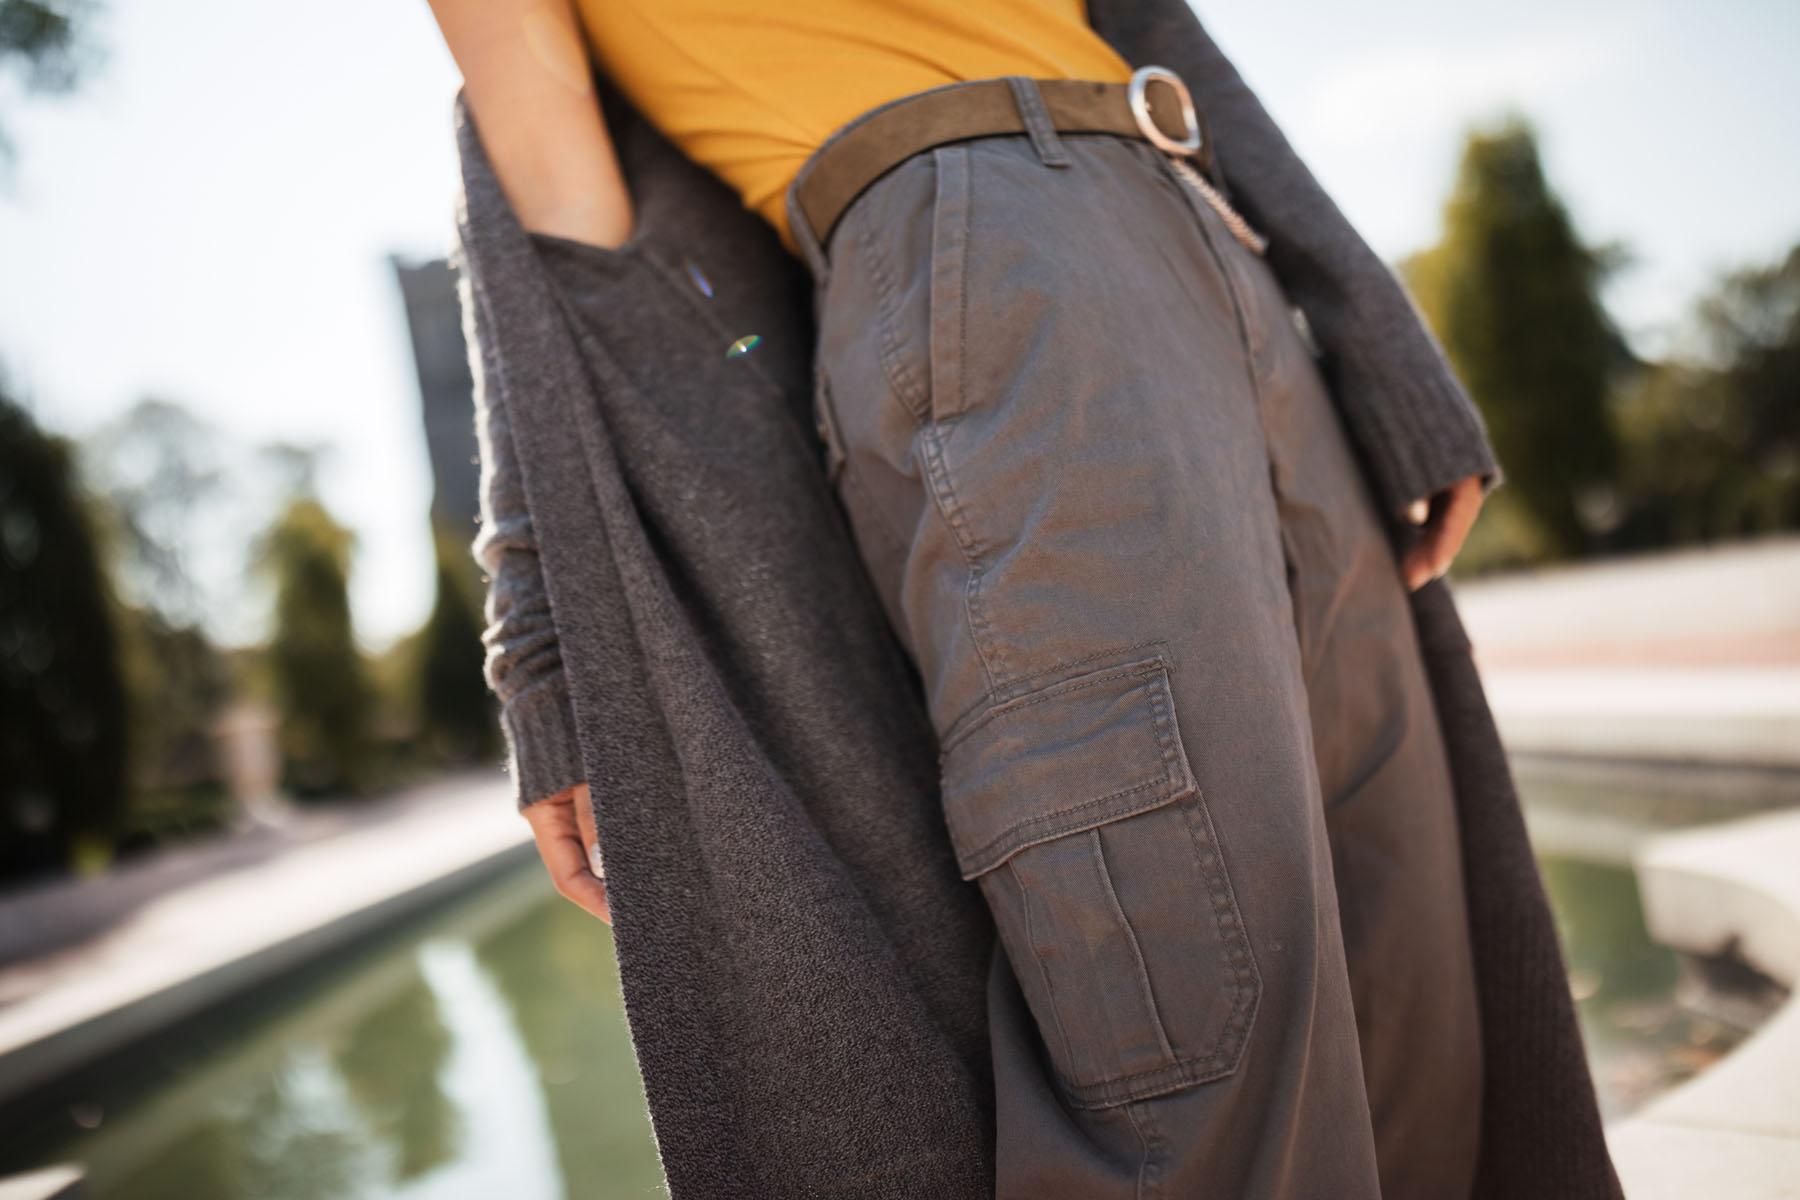 affordable fashion brand, walmart scoop, scoop nyc, affordable fall fashion, utility fashion trend, cargo pants // Notjessfashion.com